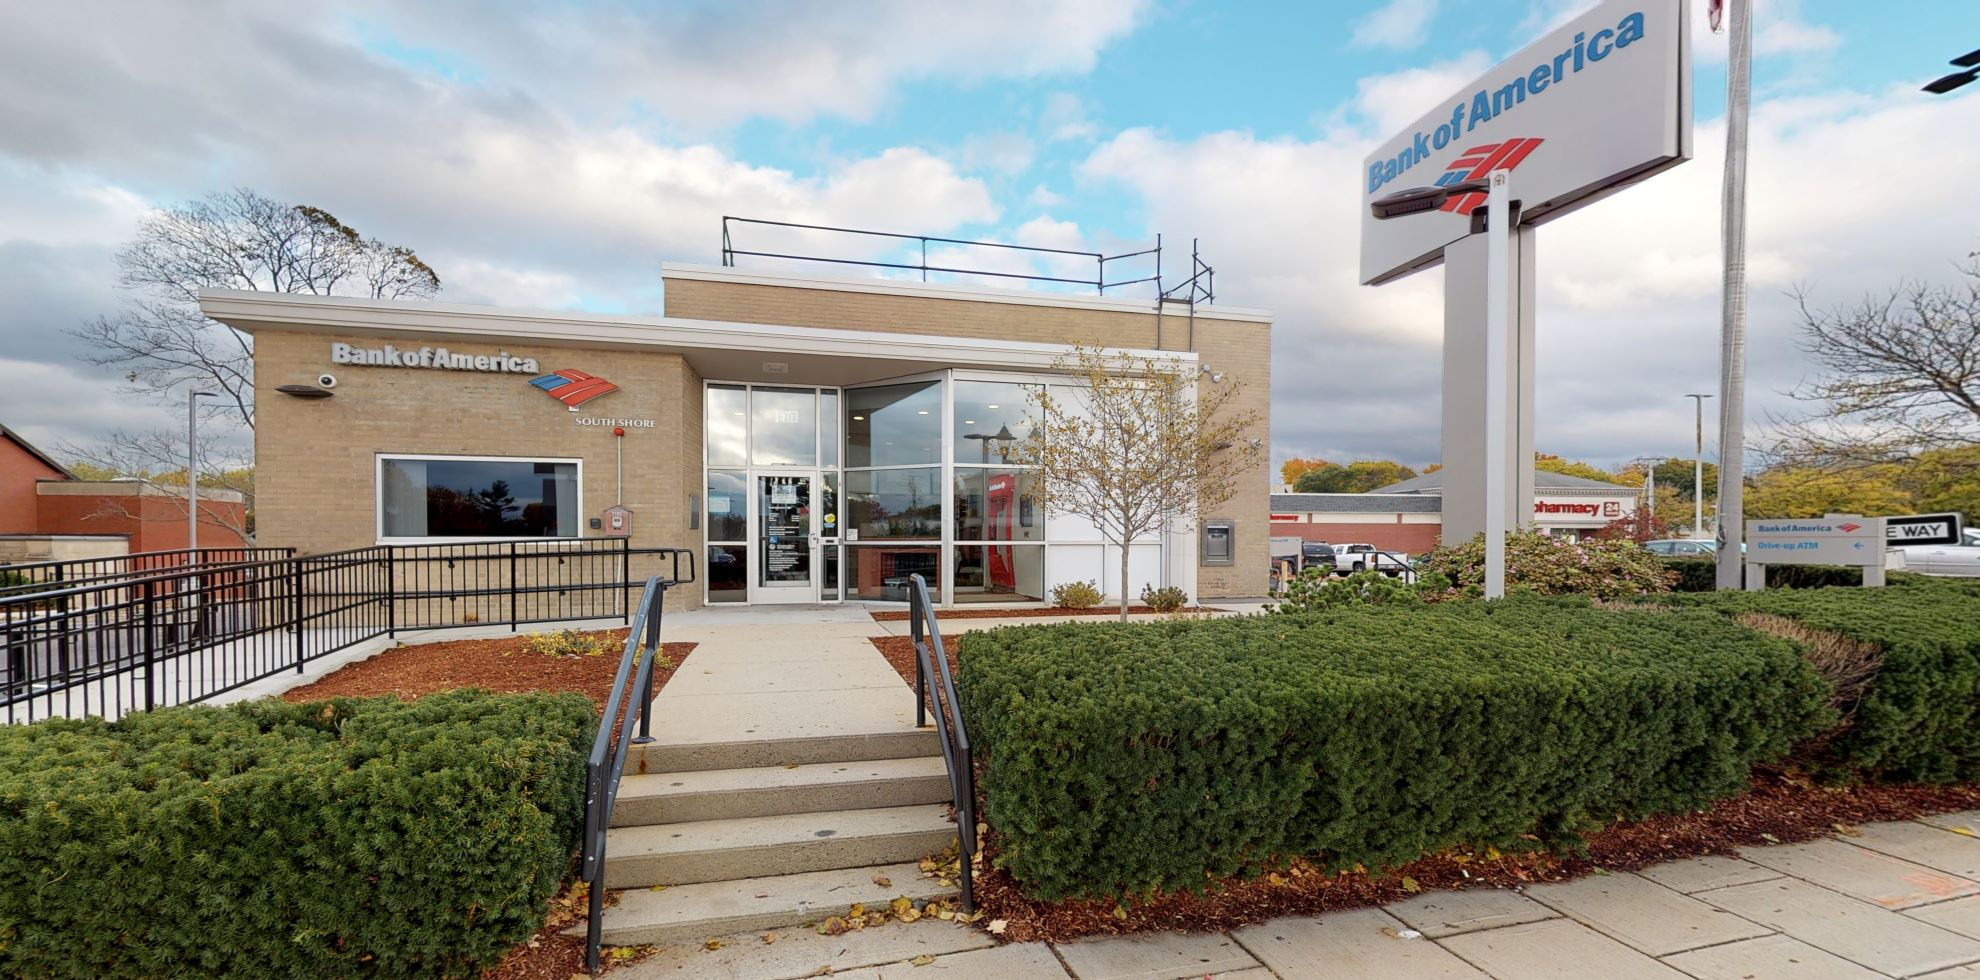 Bank of America financial center with drive-thru ATM | 173 N Main St, Randolph, MA 02368